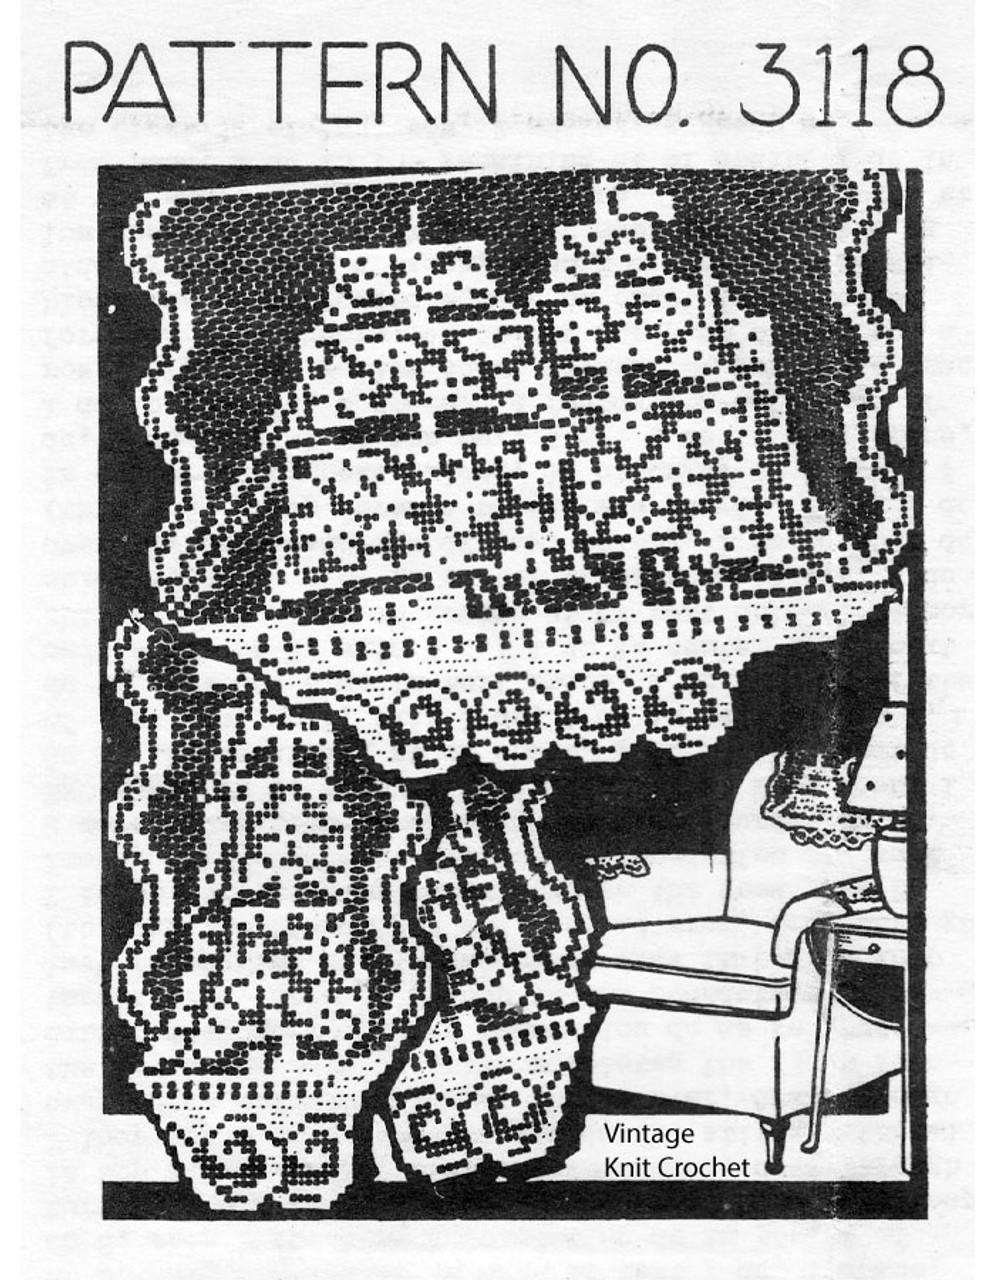 Filet Crochet Viking Ship Pattern, Mail Order 3118